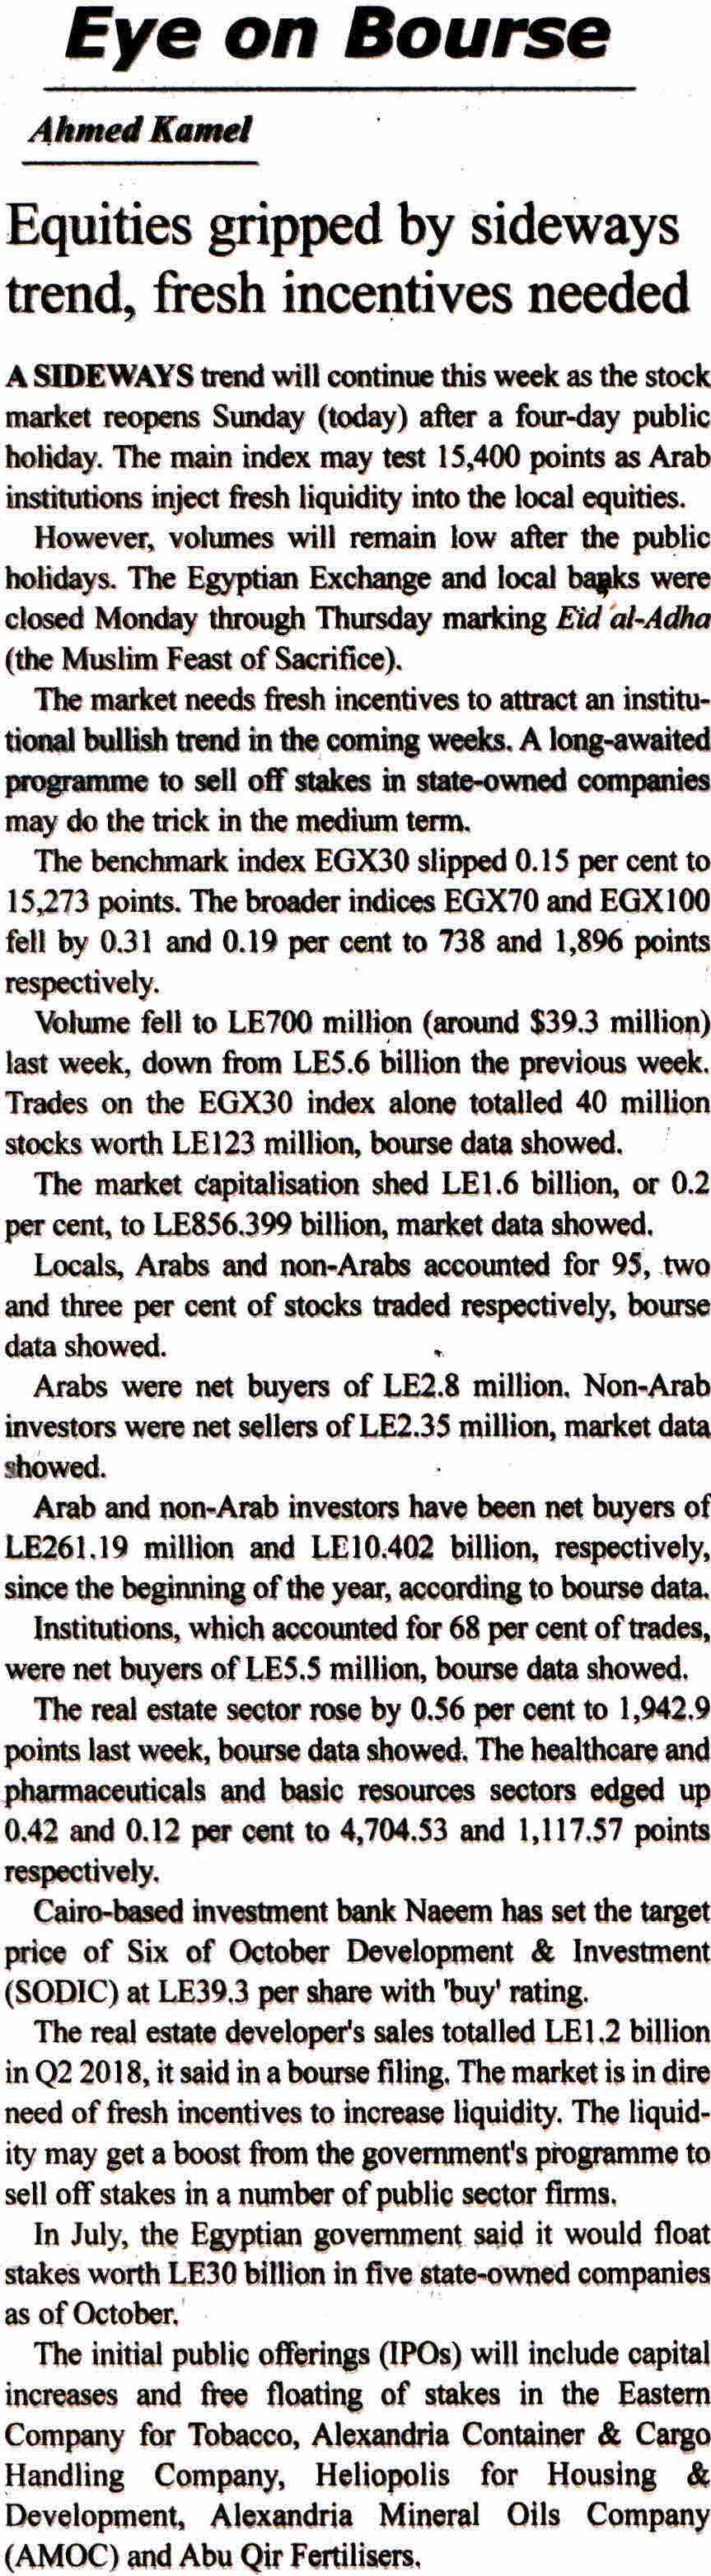 The Egyptian Gazette 26 Aug P.2.jpg